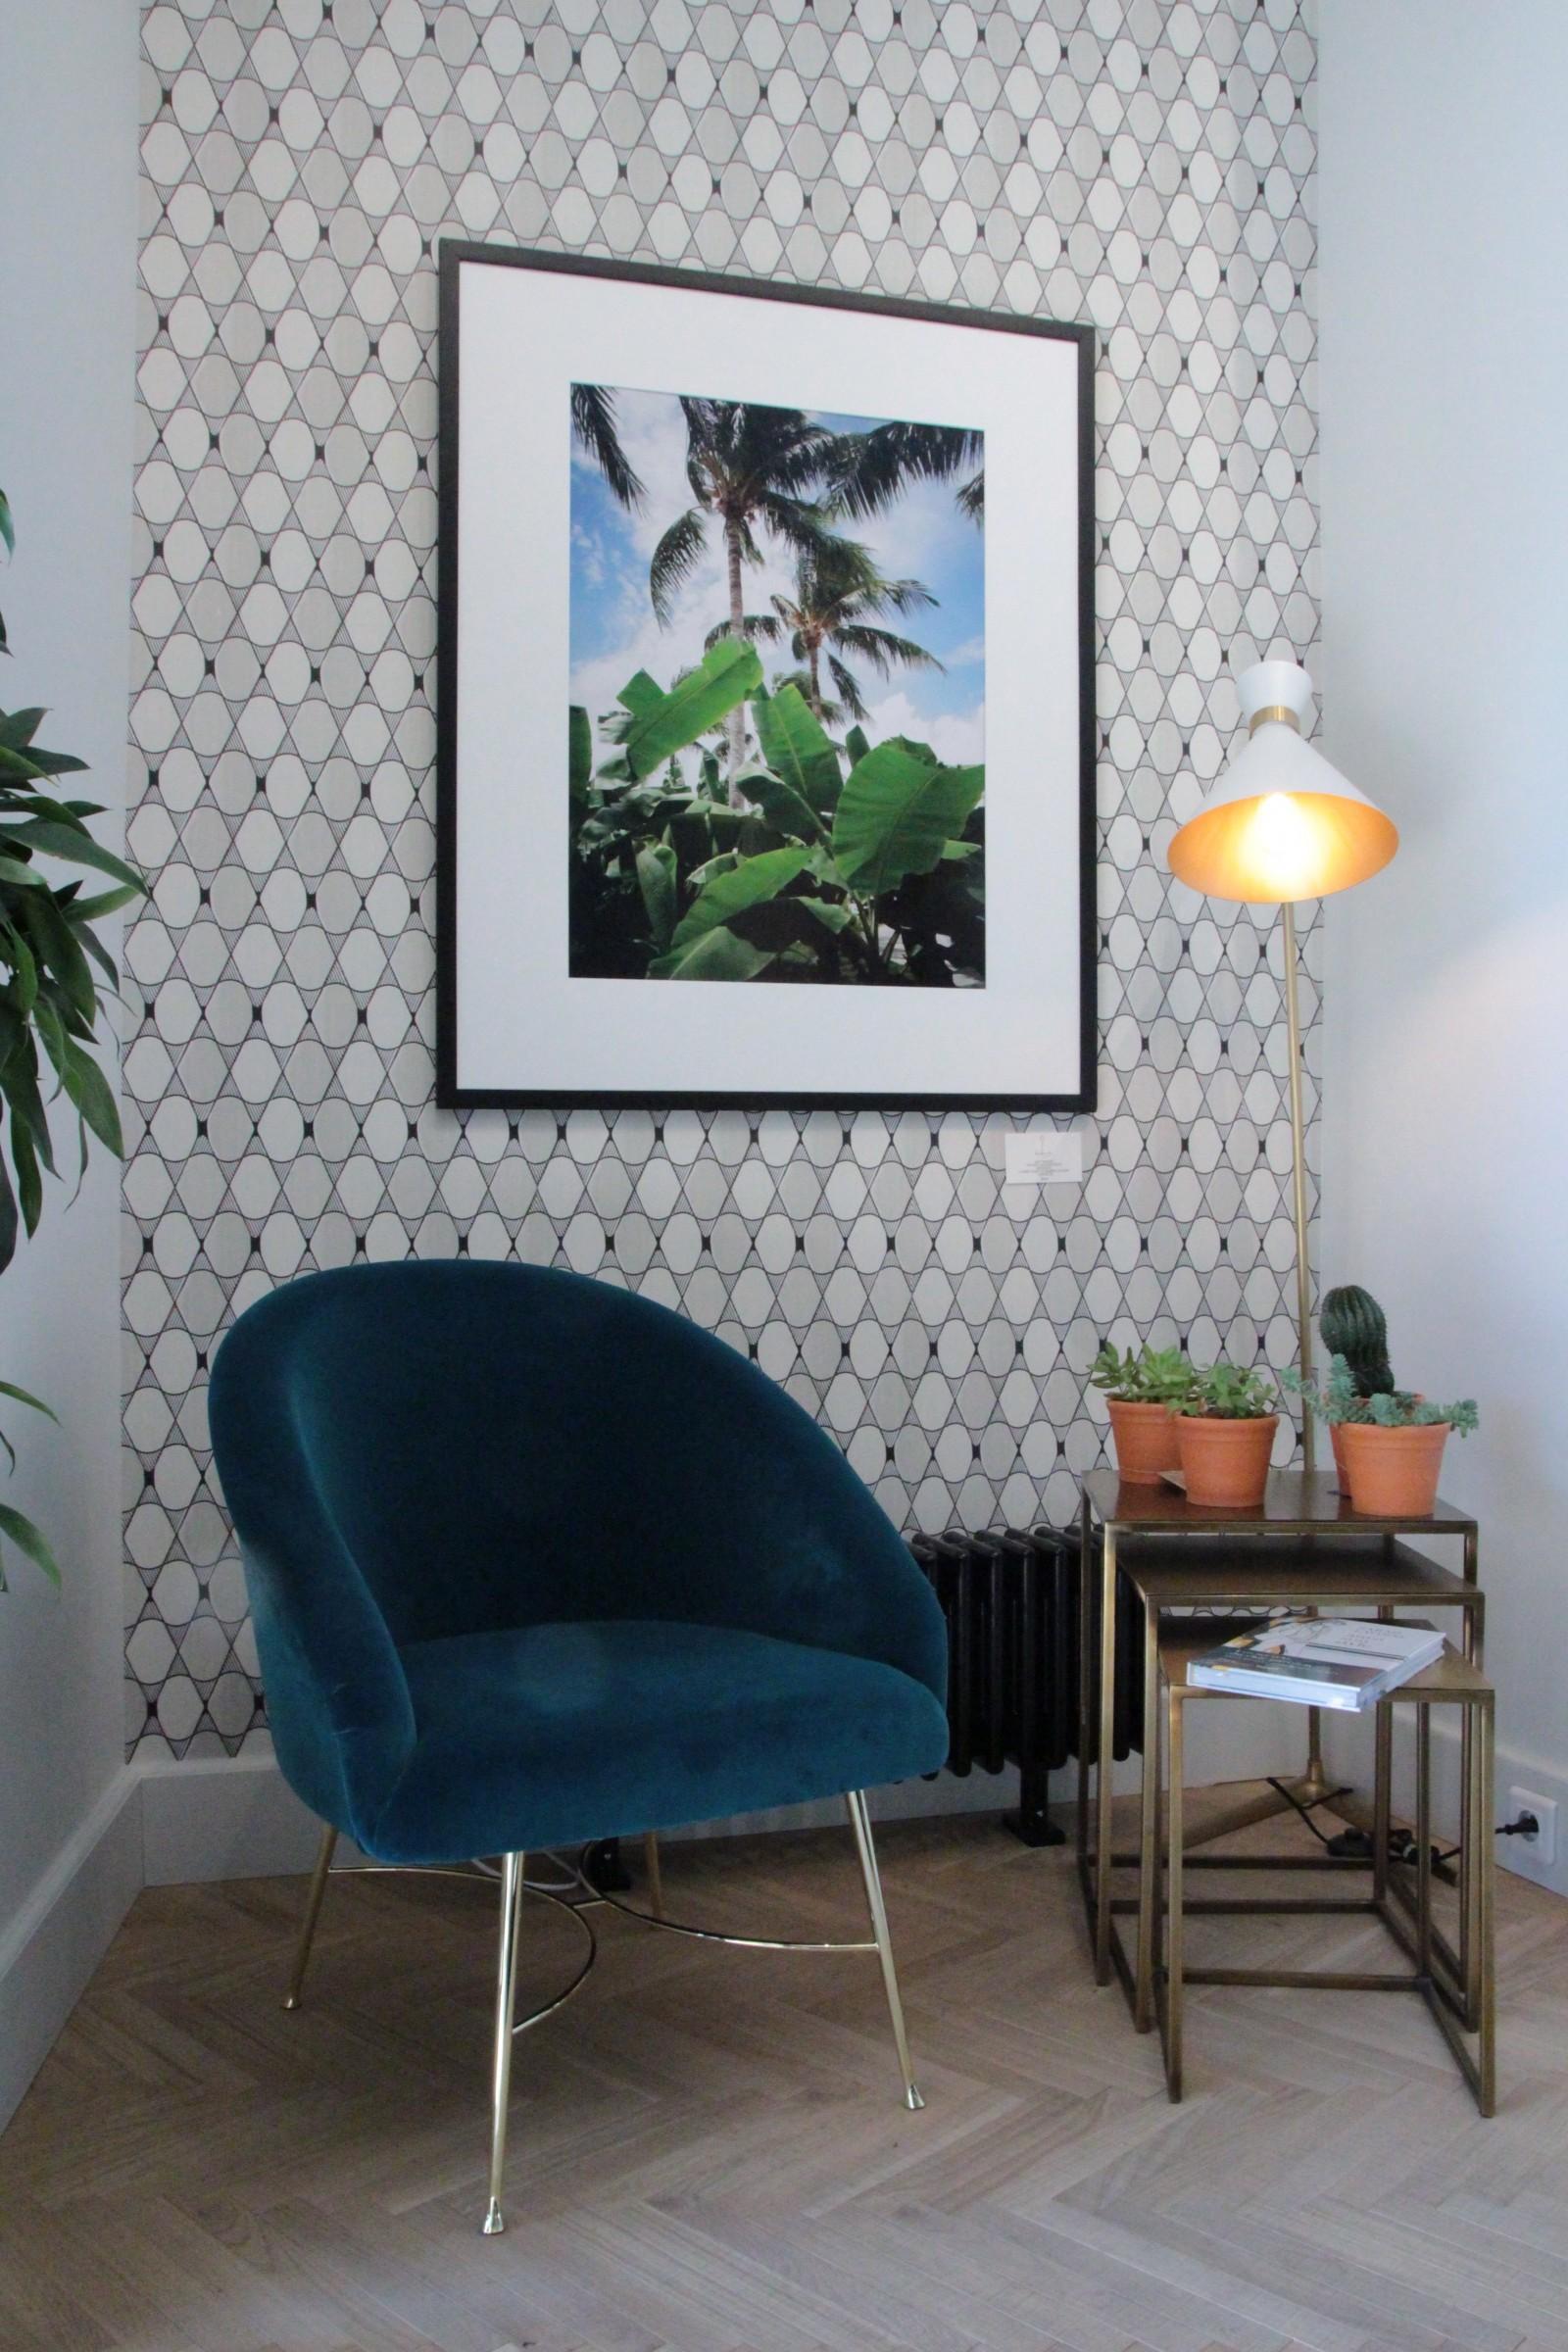 french 3 - French girl's paradise: Πώς να κάνεις το σπίτι σου να μοιάζει με παριζιάνικο «ναό» της αισθητικής